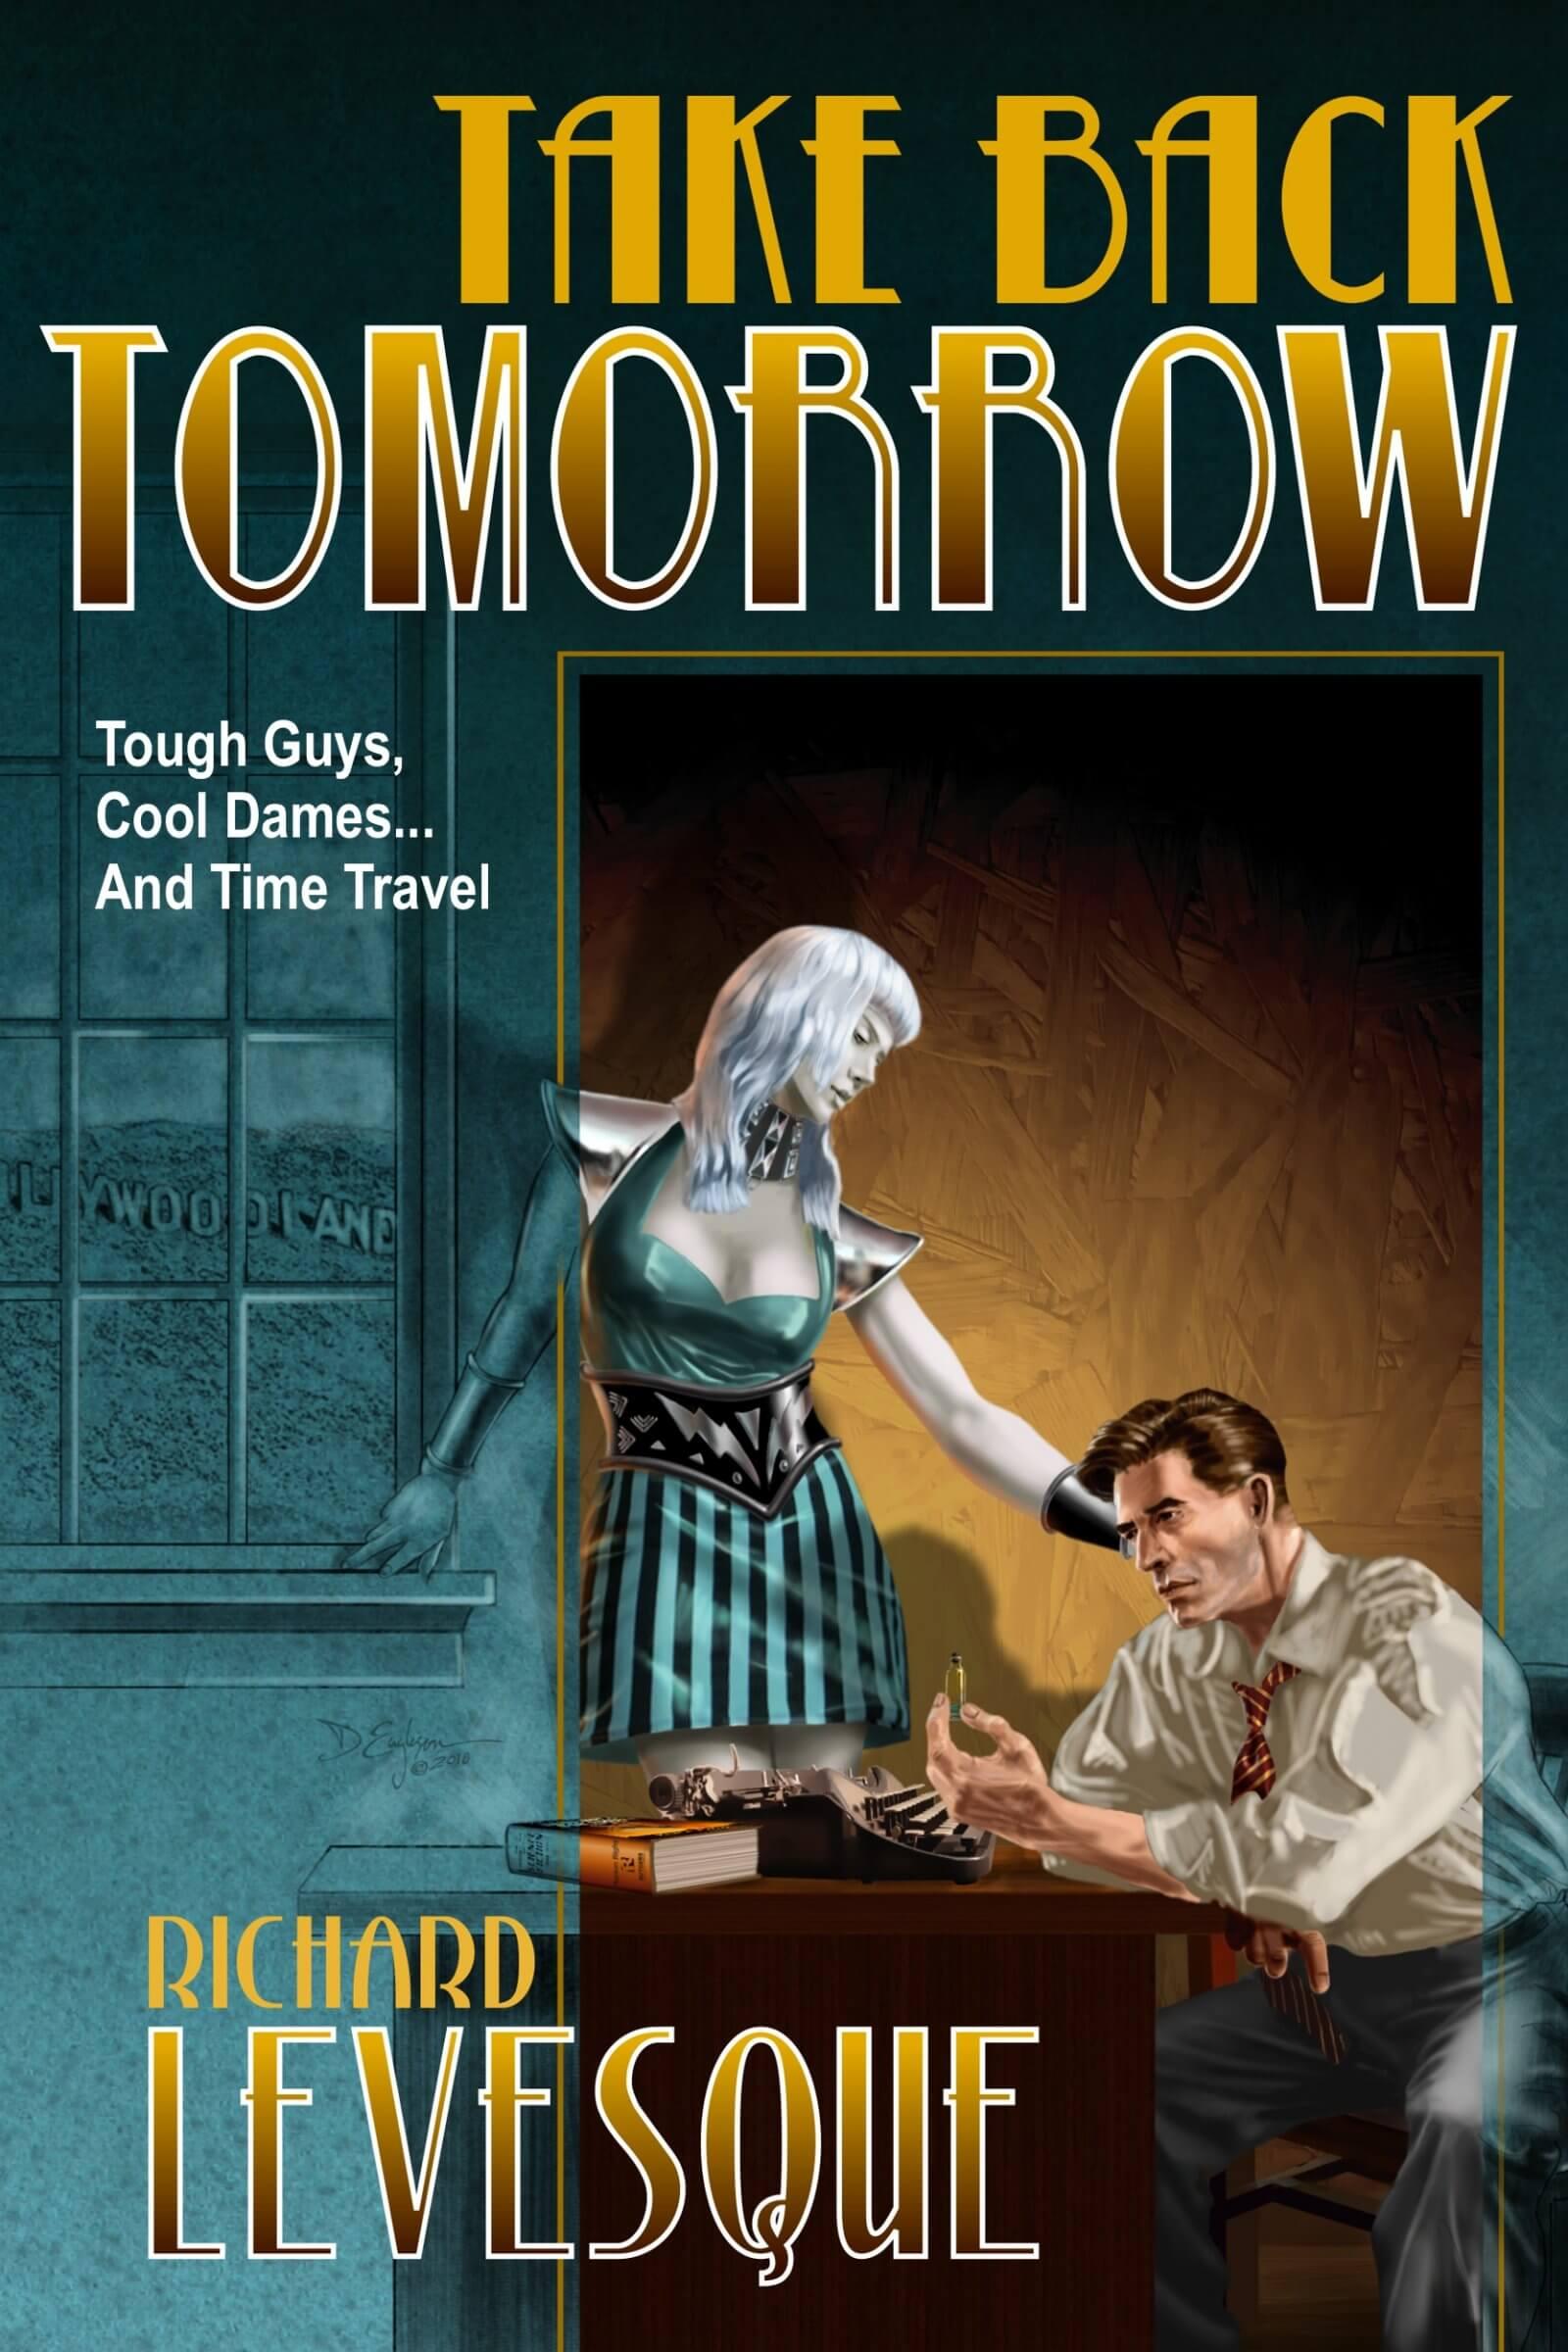 Take Back Tomorrow book cover design by Corvid Design